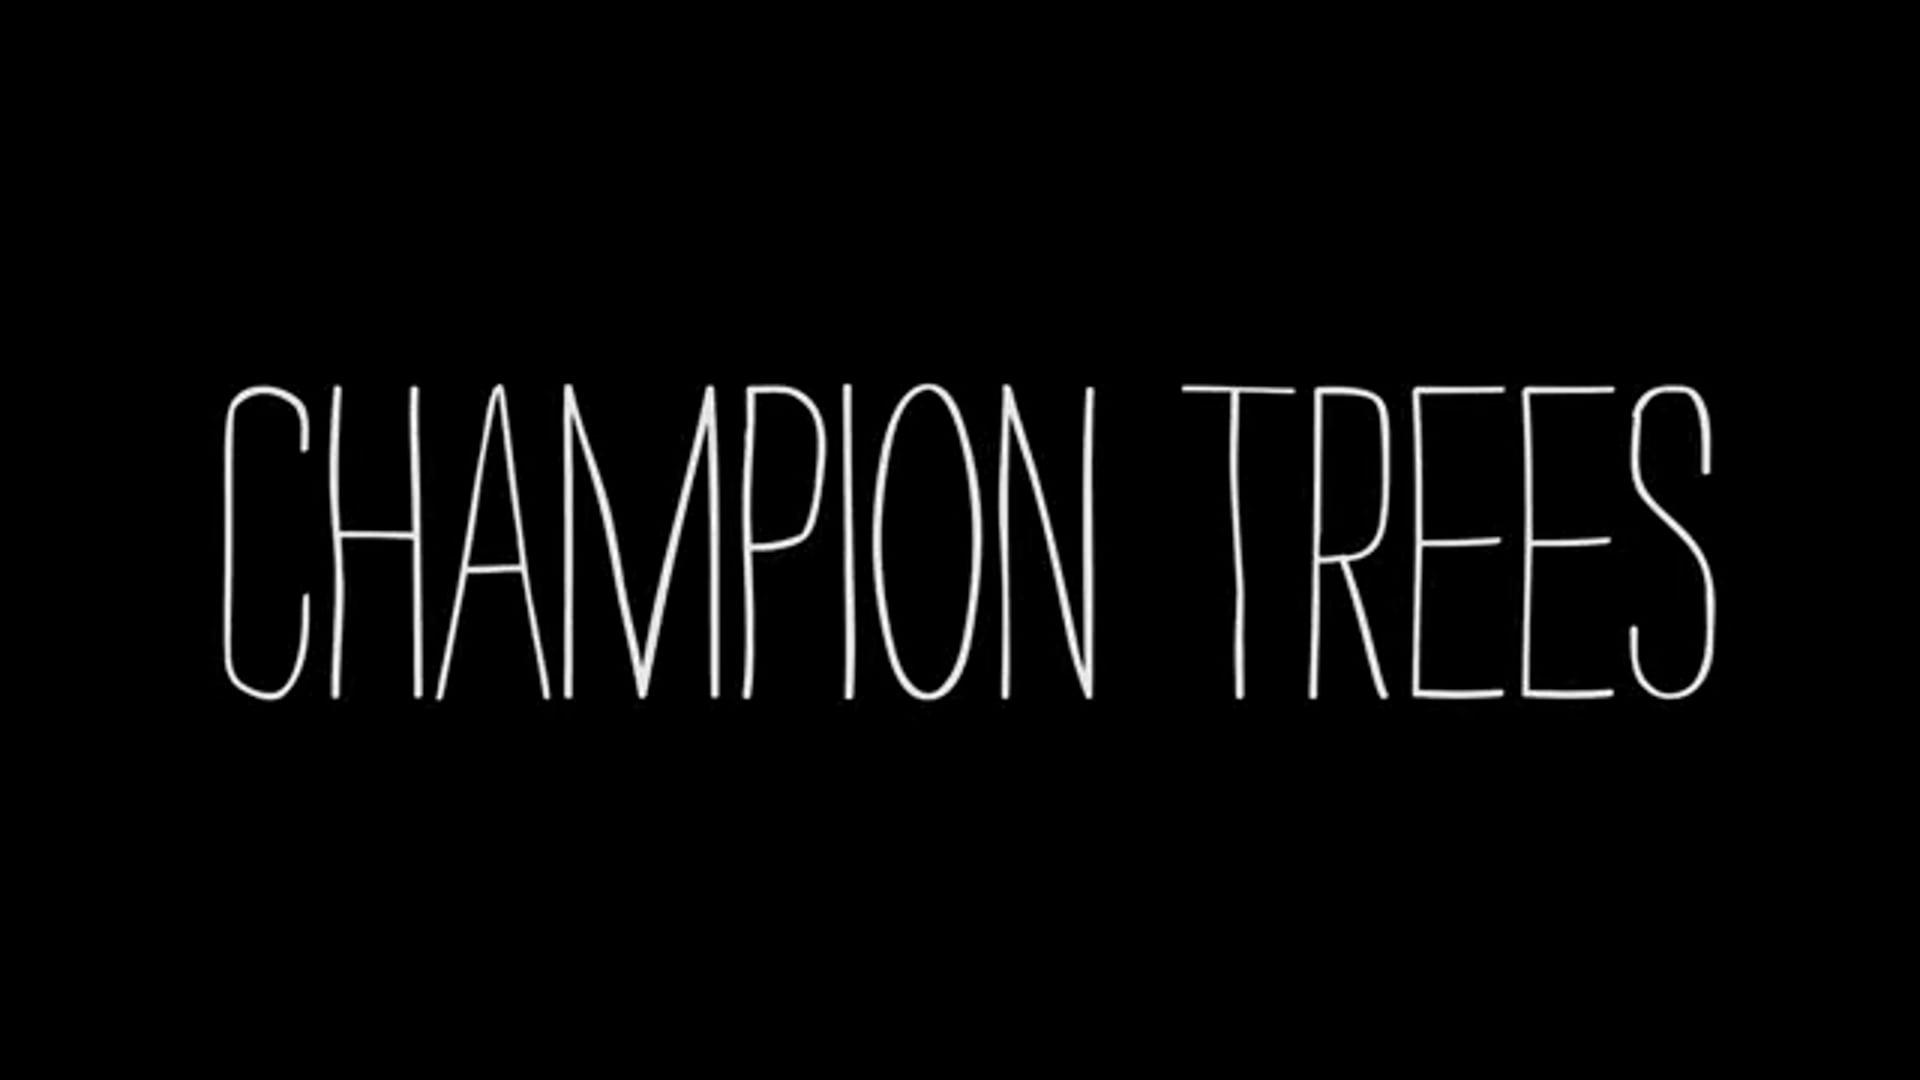 CHAMPION TREES: CLIP